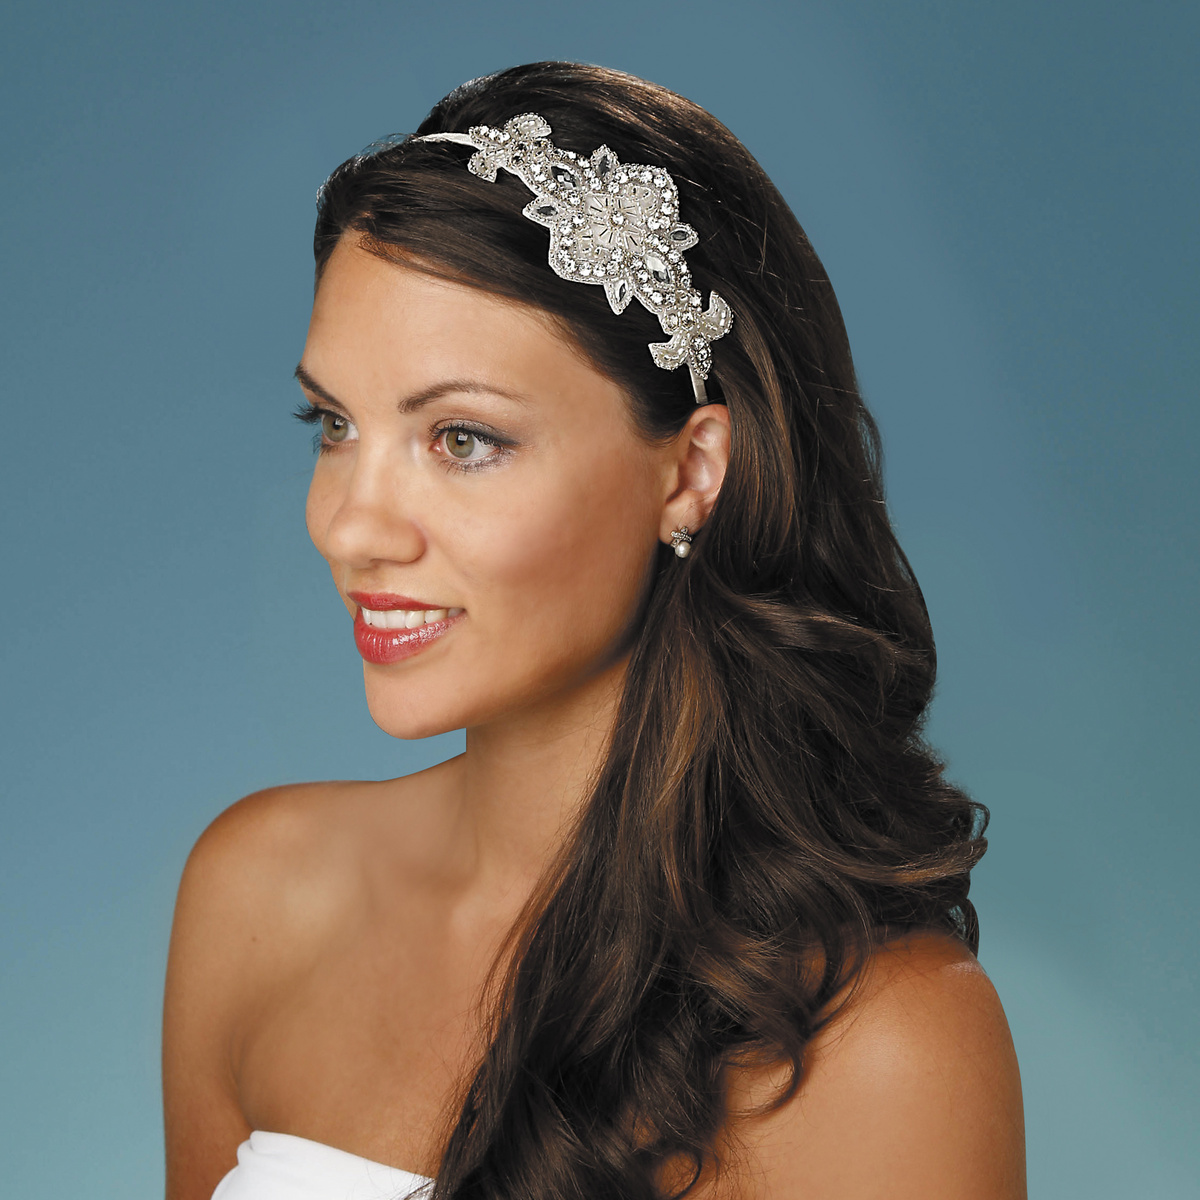 david tutera™ applique embellished side headband, cream color | joann